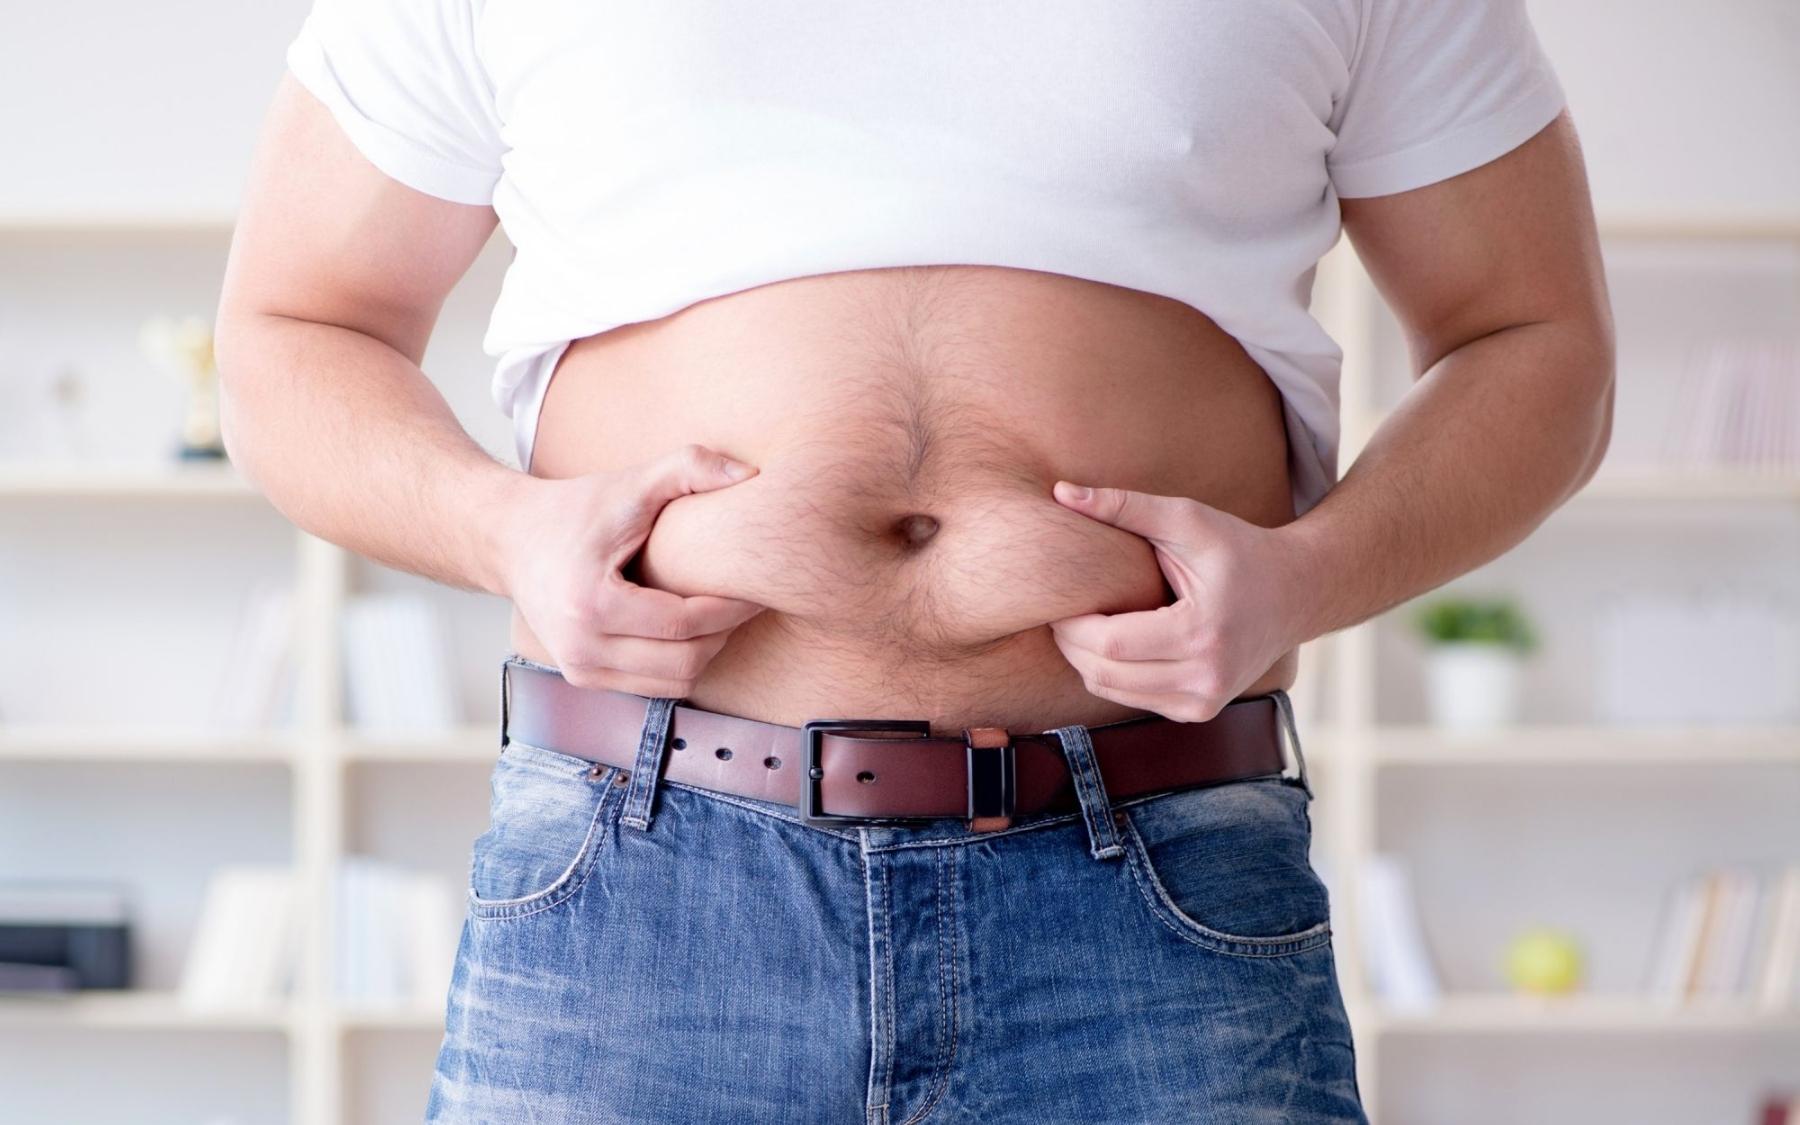 Does Obesity impact male fertility Jonathan Ramsay